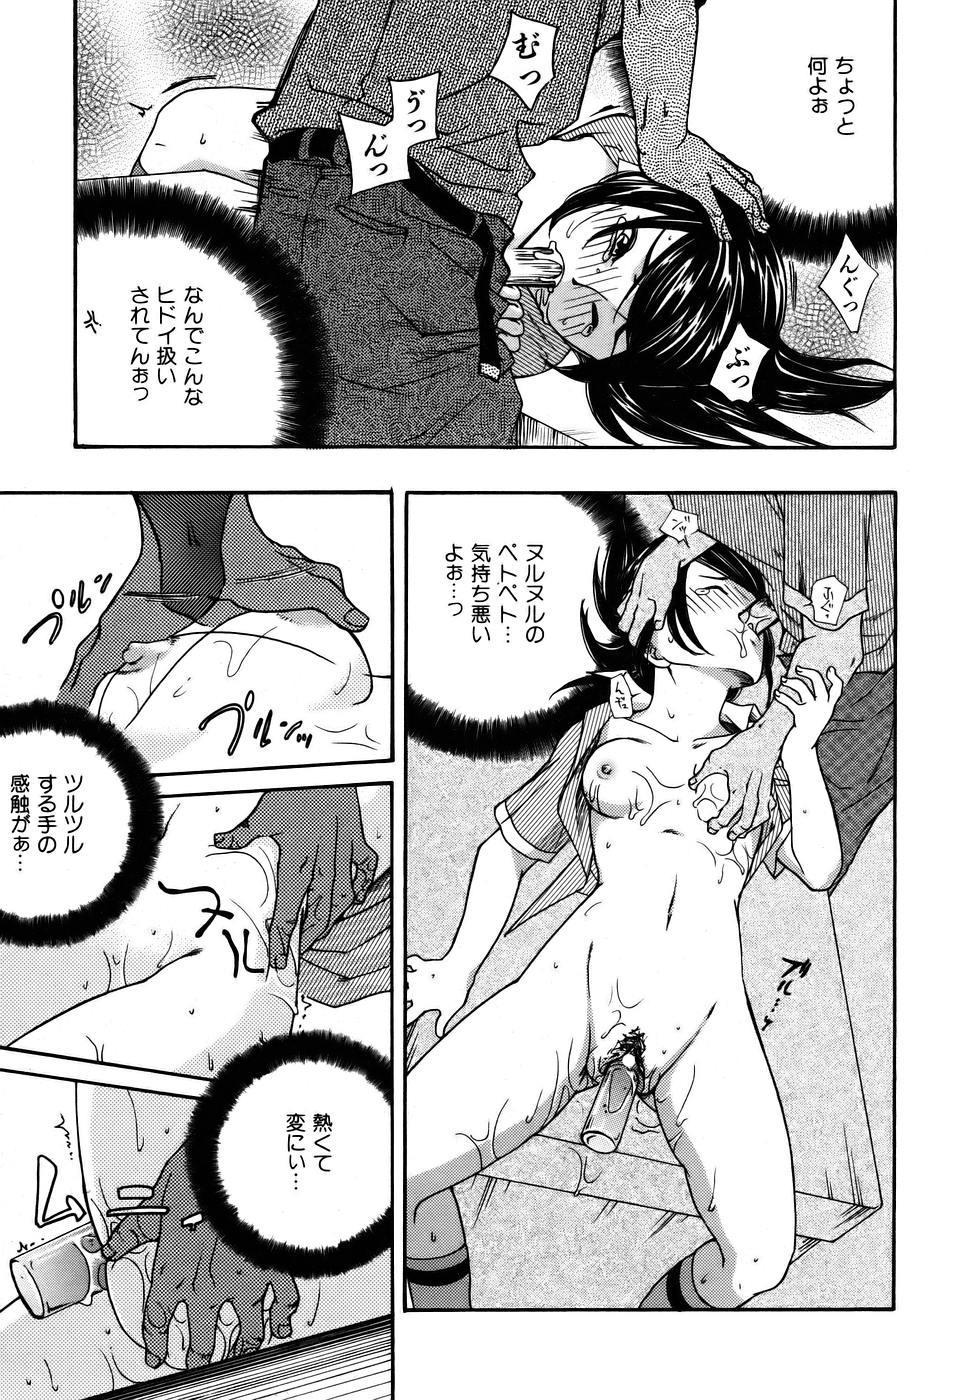 COMIC AUN 2005-12 Vol. 115 252